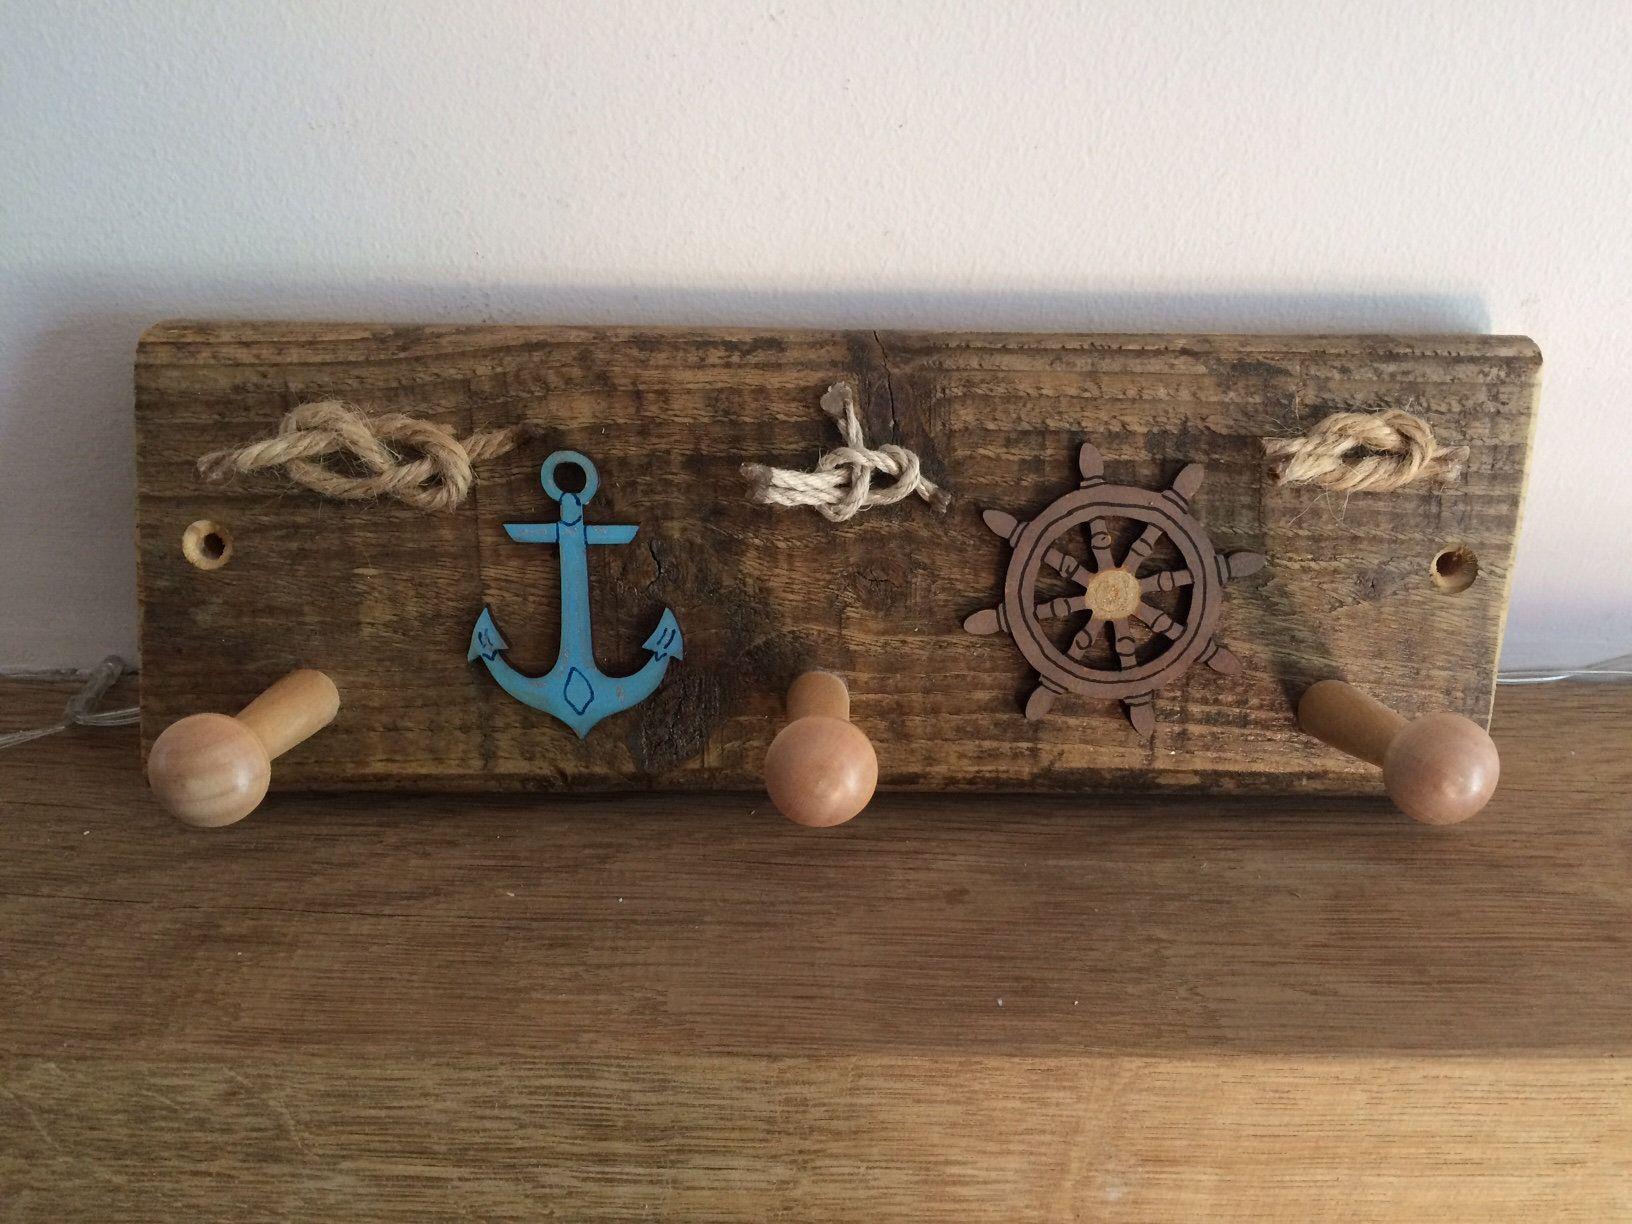 Rustic Rope Knots Wooden Coat Pegs Nautical Themed Coat Rack Sea Faring Coat Hooks Rustic Recycled Wood Quirky Bathroom Towel Rack In 2020 Coat Pegs Recycled Wood Quirky Bathroom